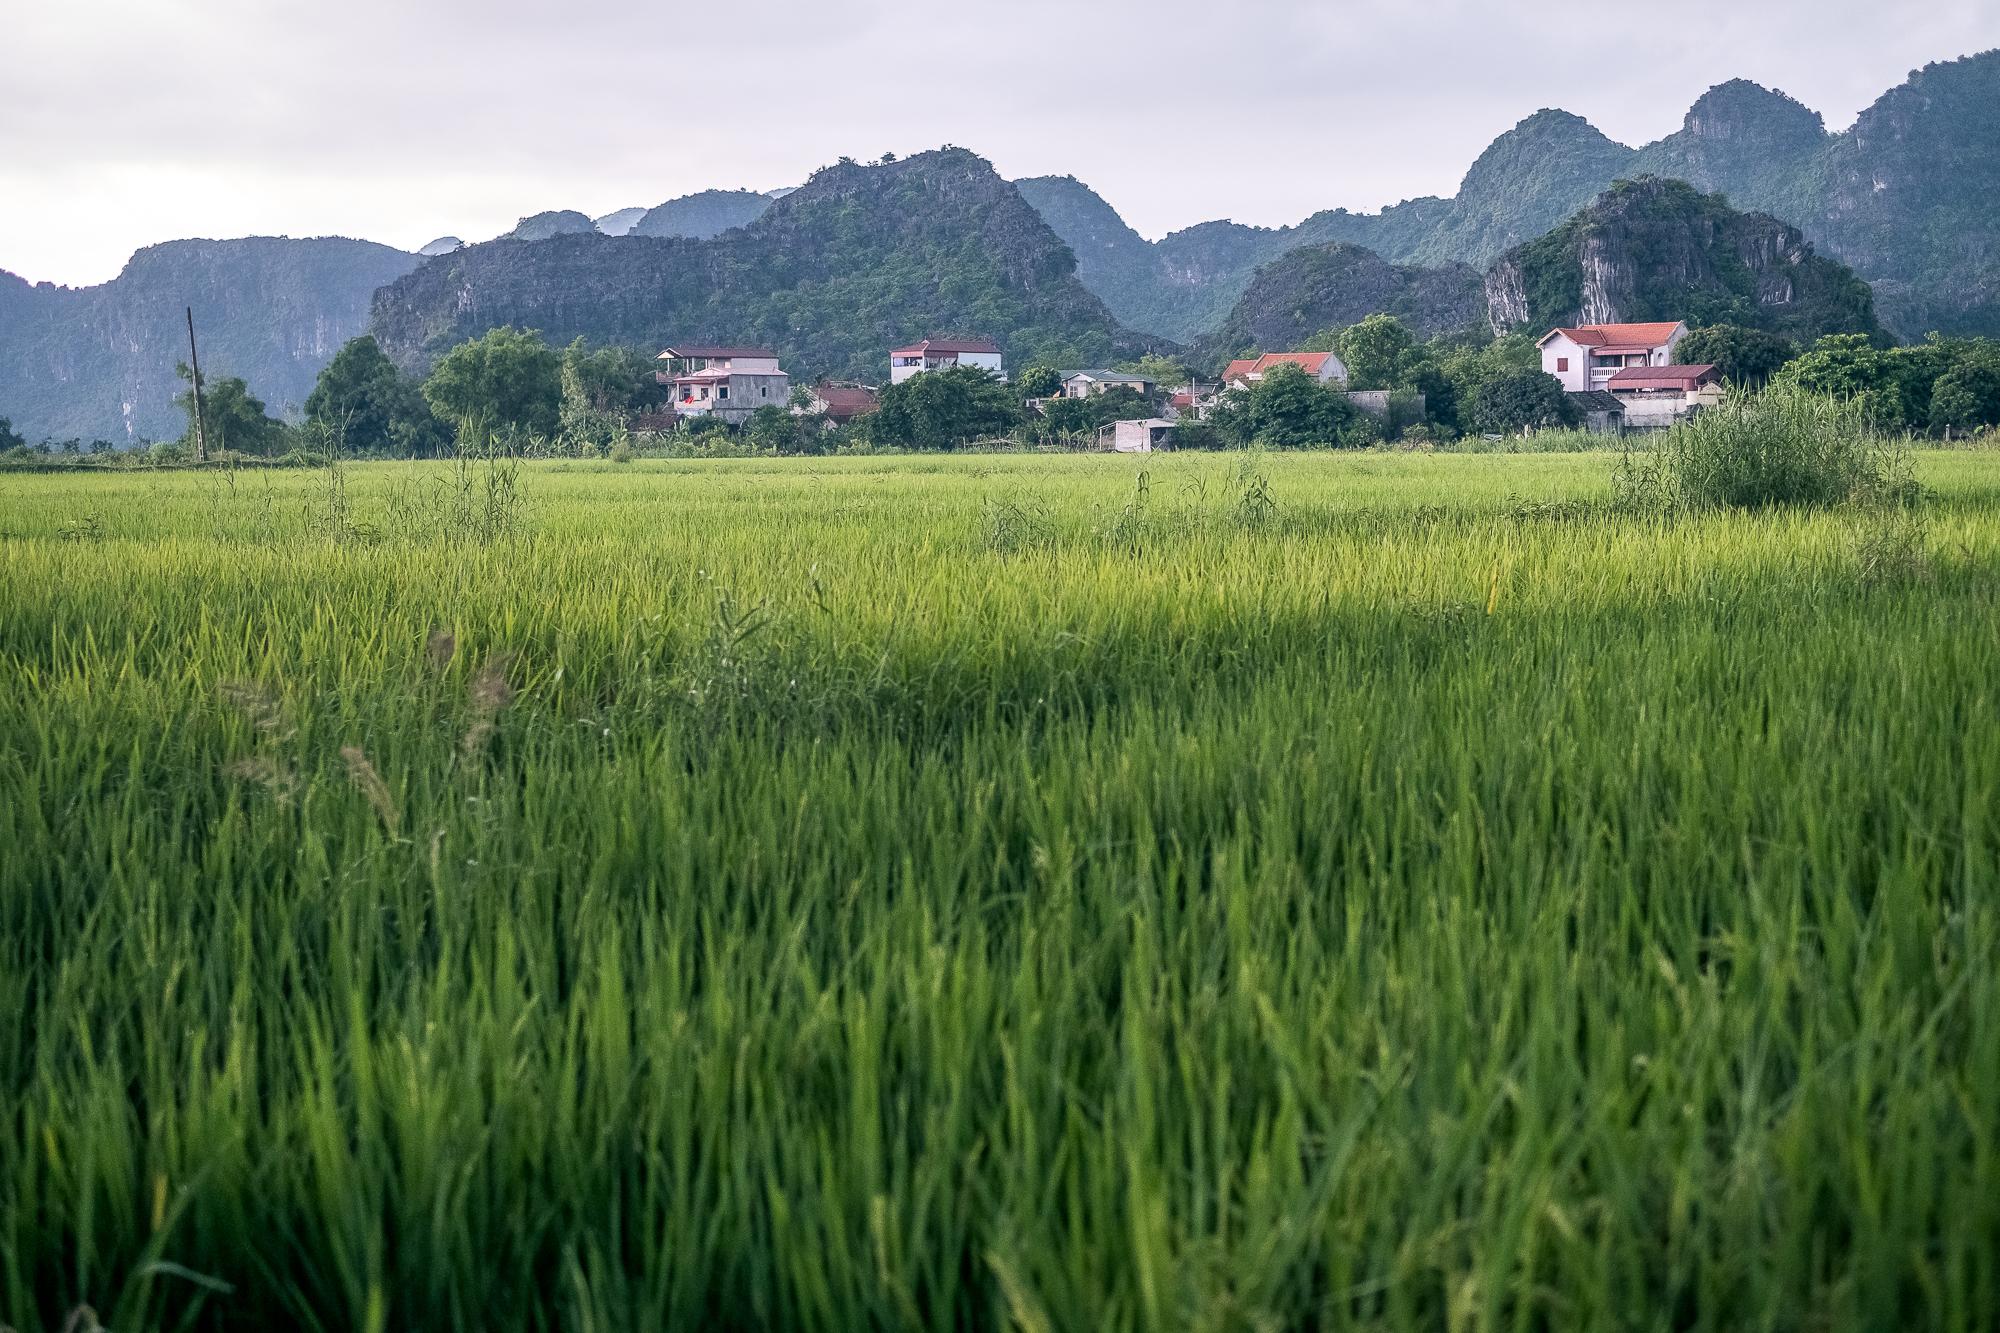 Vietnam_Honeymoon_TheOutsiderBlog_DSCF8765.JPG